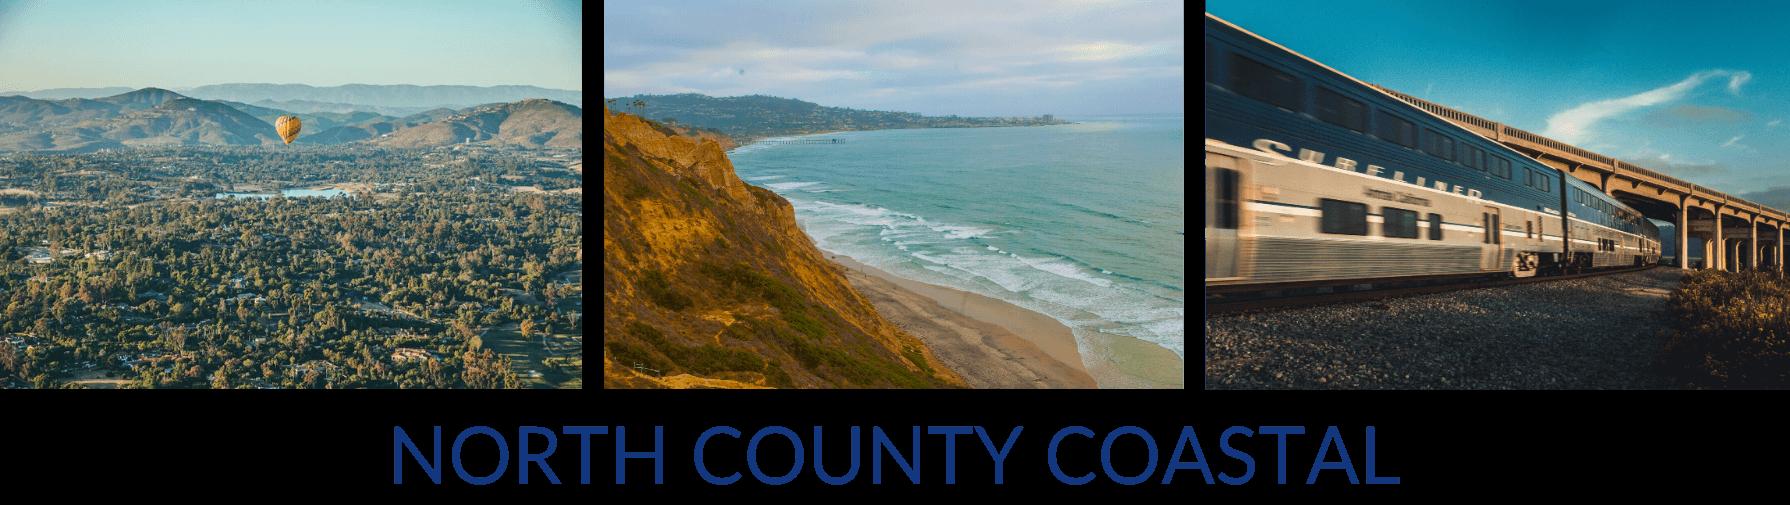 North County Coastal3-2